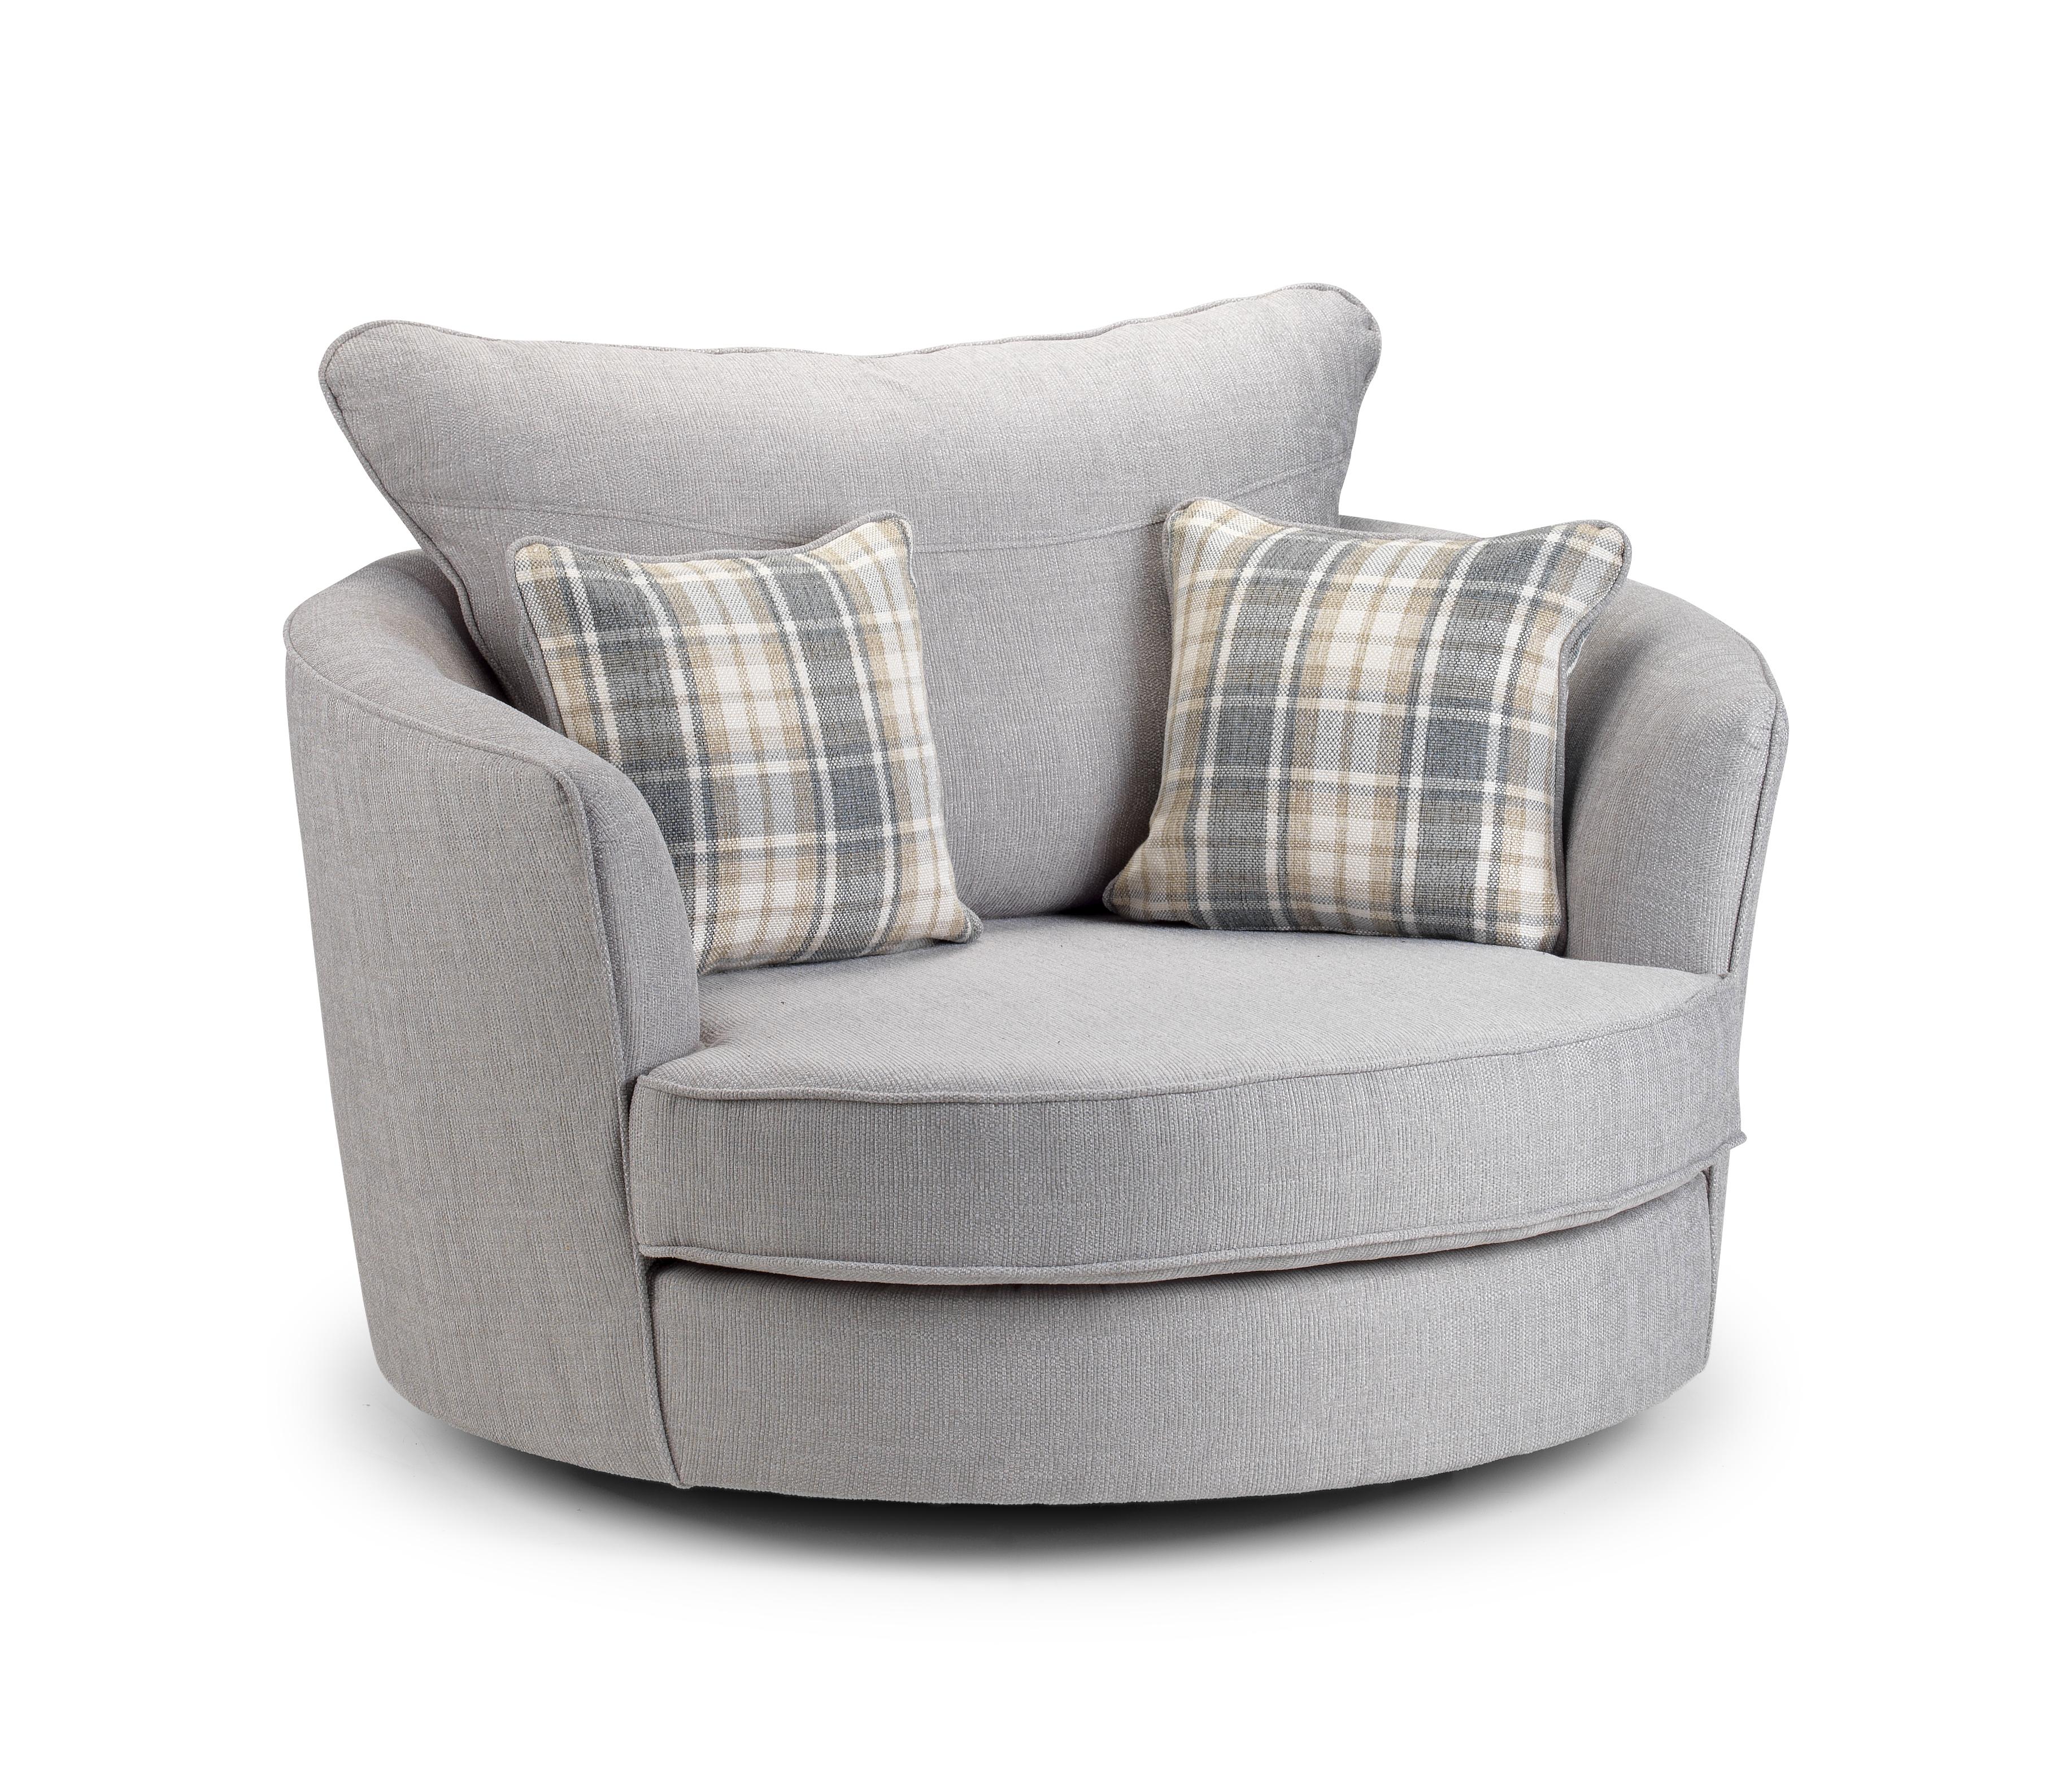 Swivel Sofa Chairs Inside Swivel Sofa Chairs (Image 14 of 15)